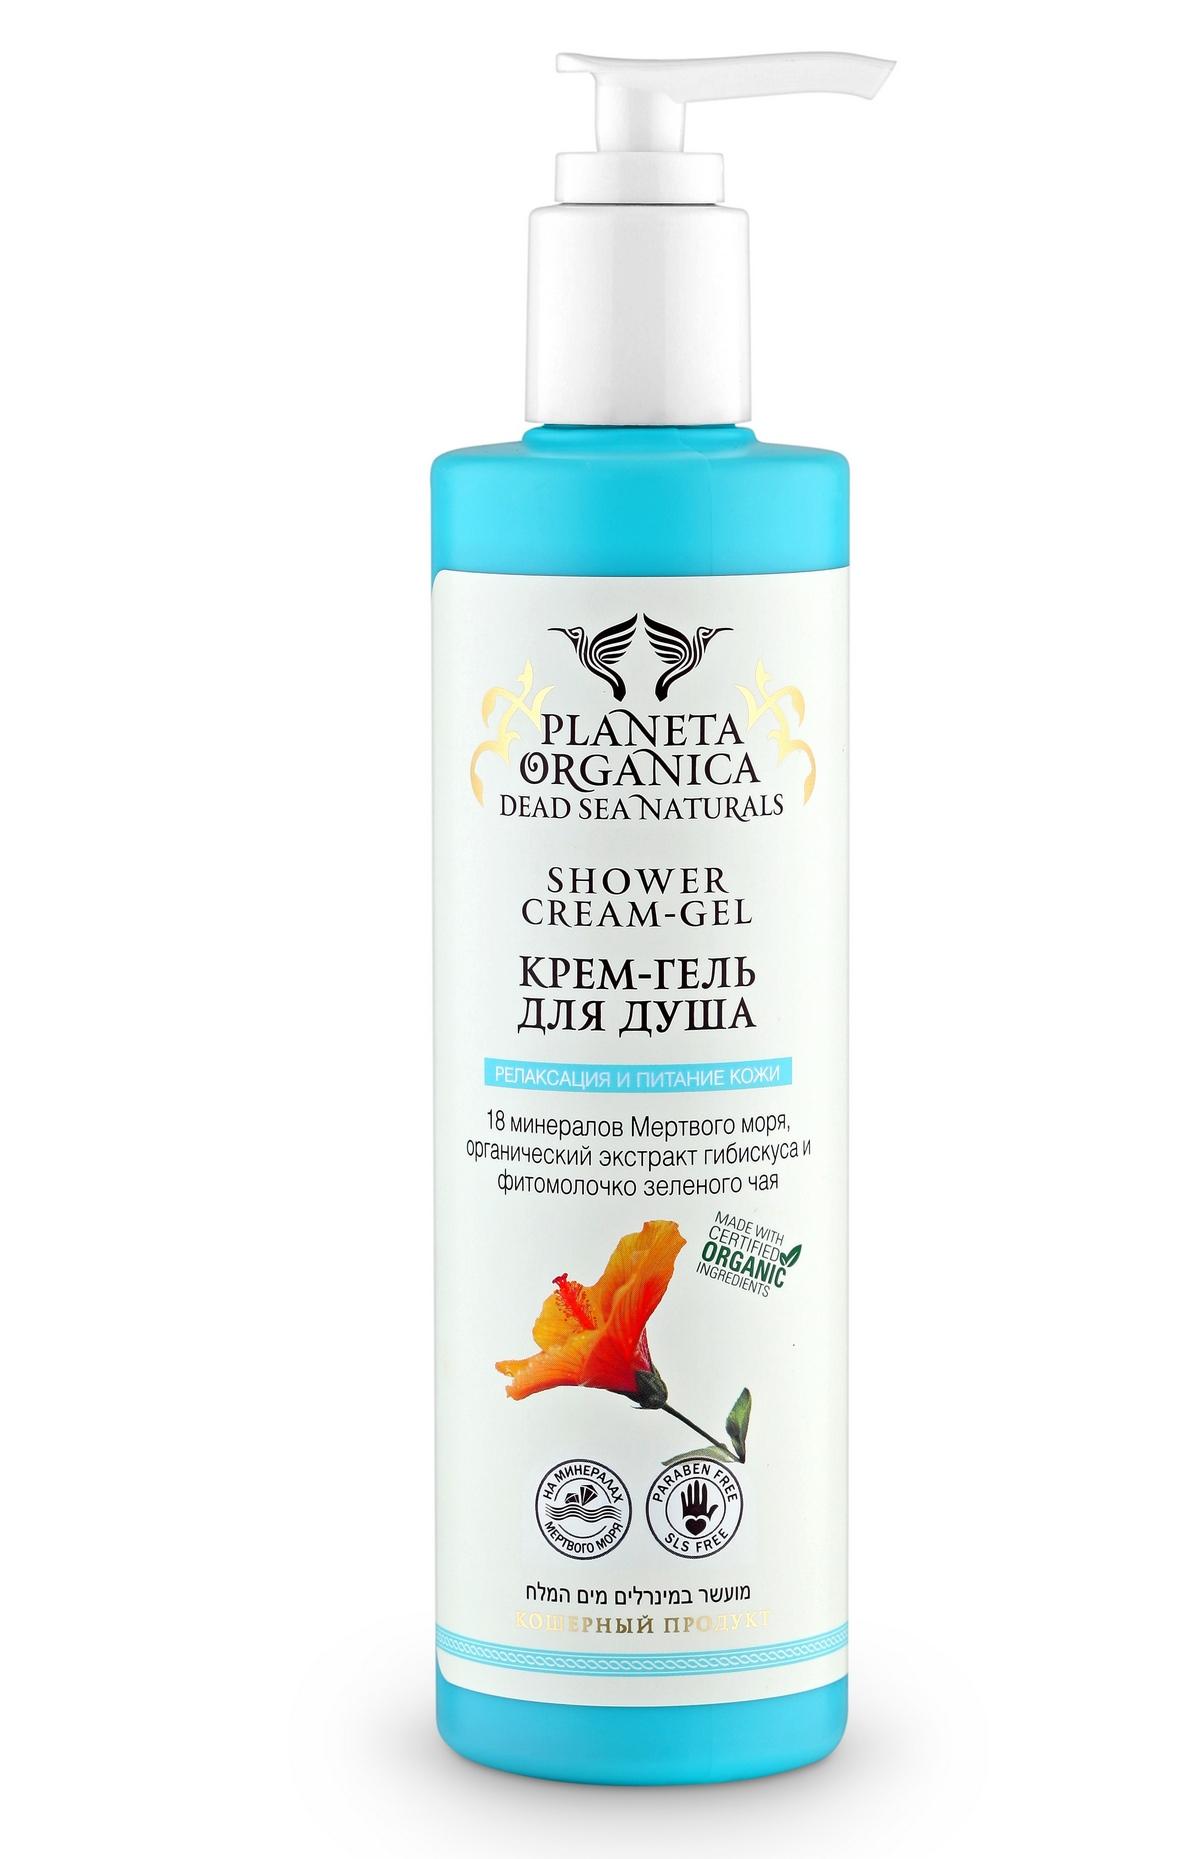 Planeta organica DEAD SEA NATURALS. Гель-крем для душа релаксация/питание 280 мл. (Planeta Organica)